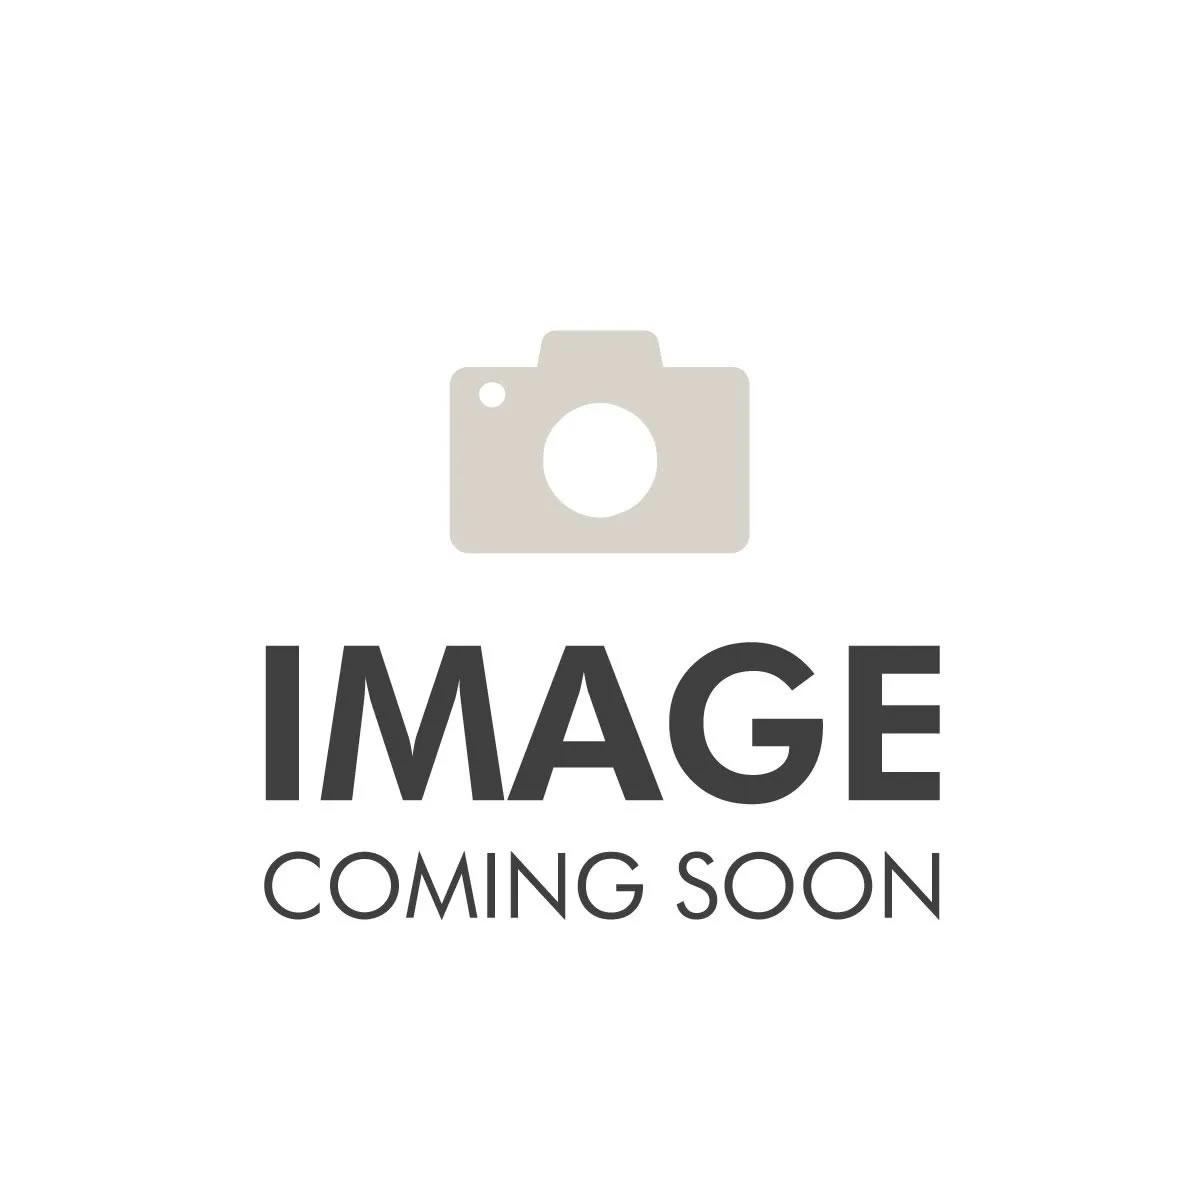 1997 TJ Wrangler Sahara project Jeep